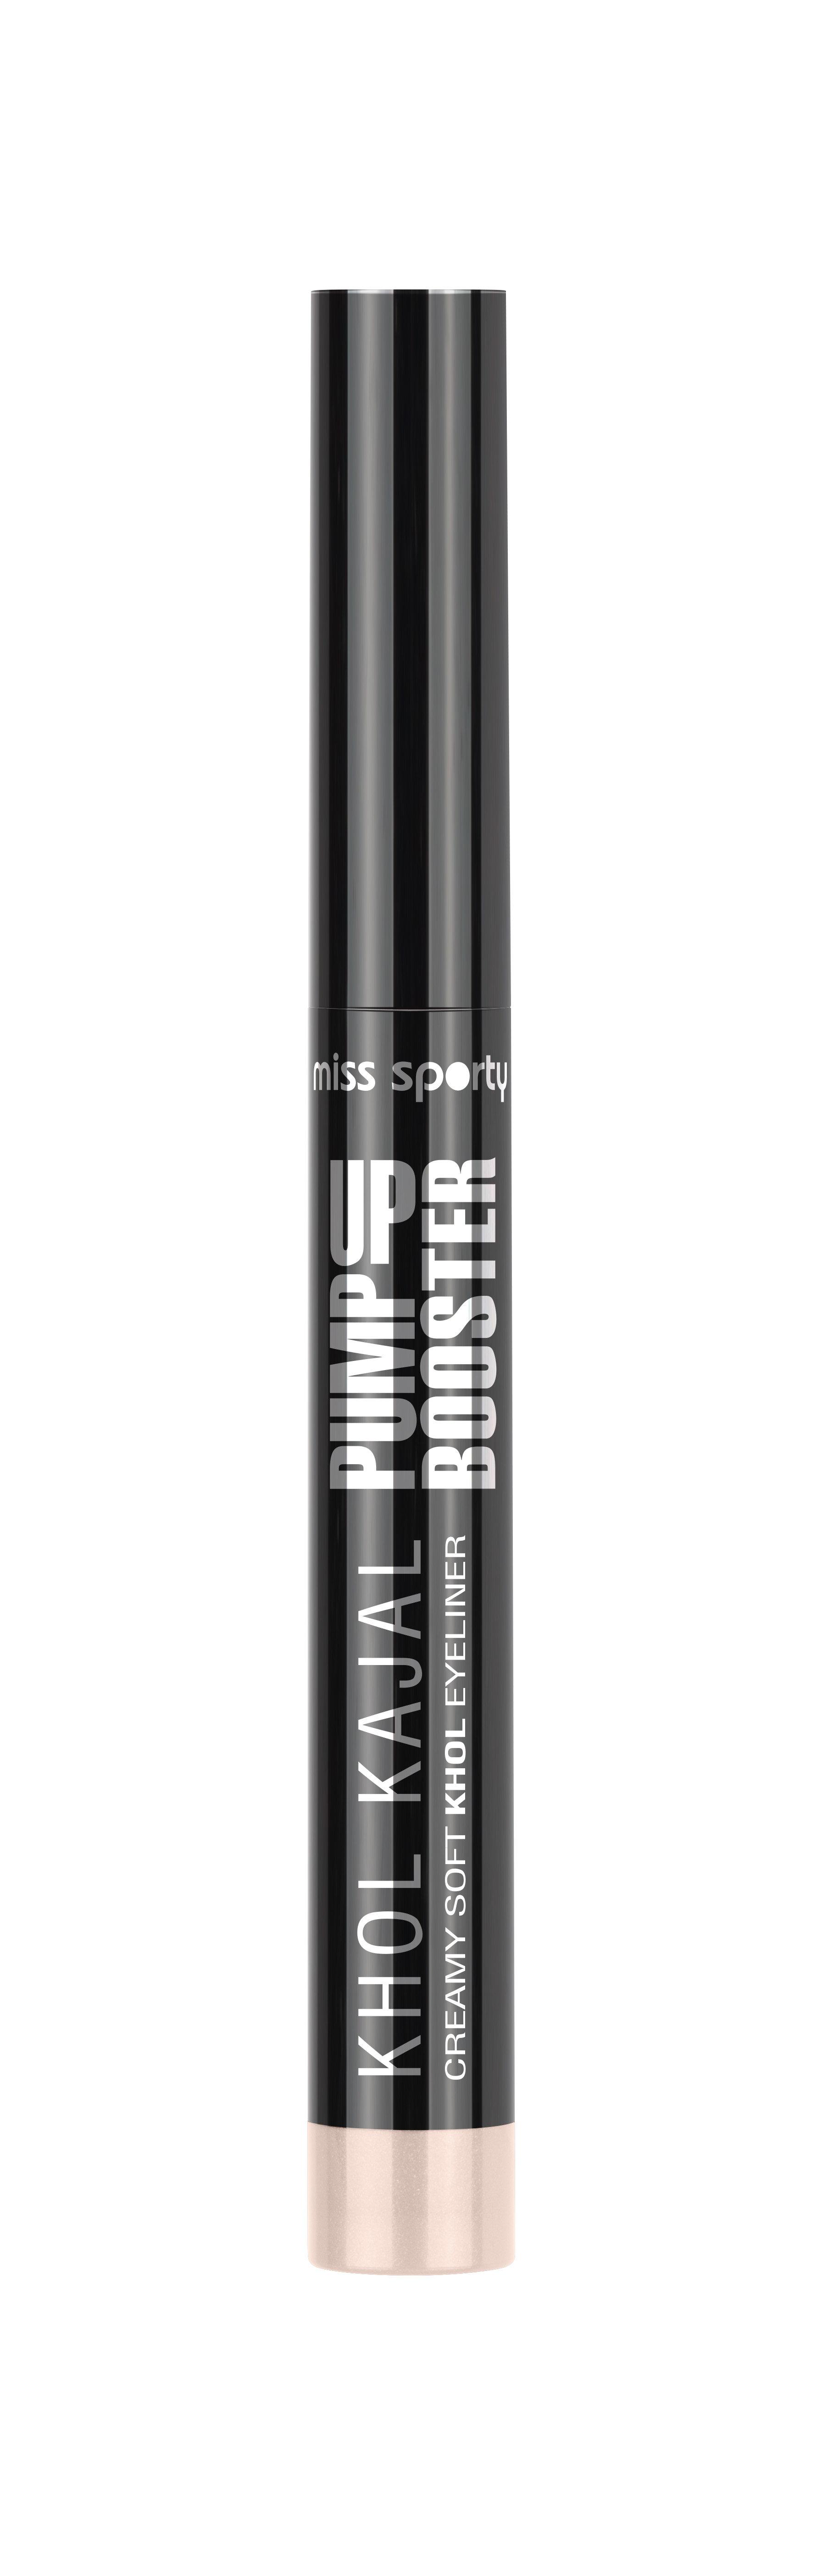 Akių kontūro pieštukas Miss Sporty Pump Up Booster Kohl Kajal 2.2 g